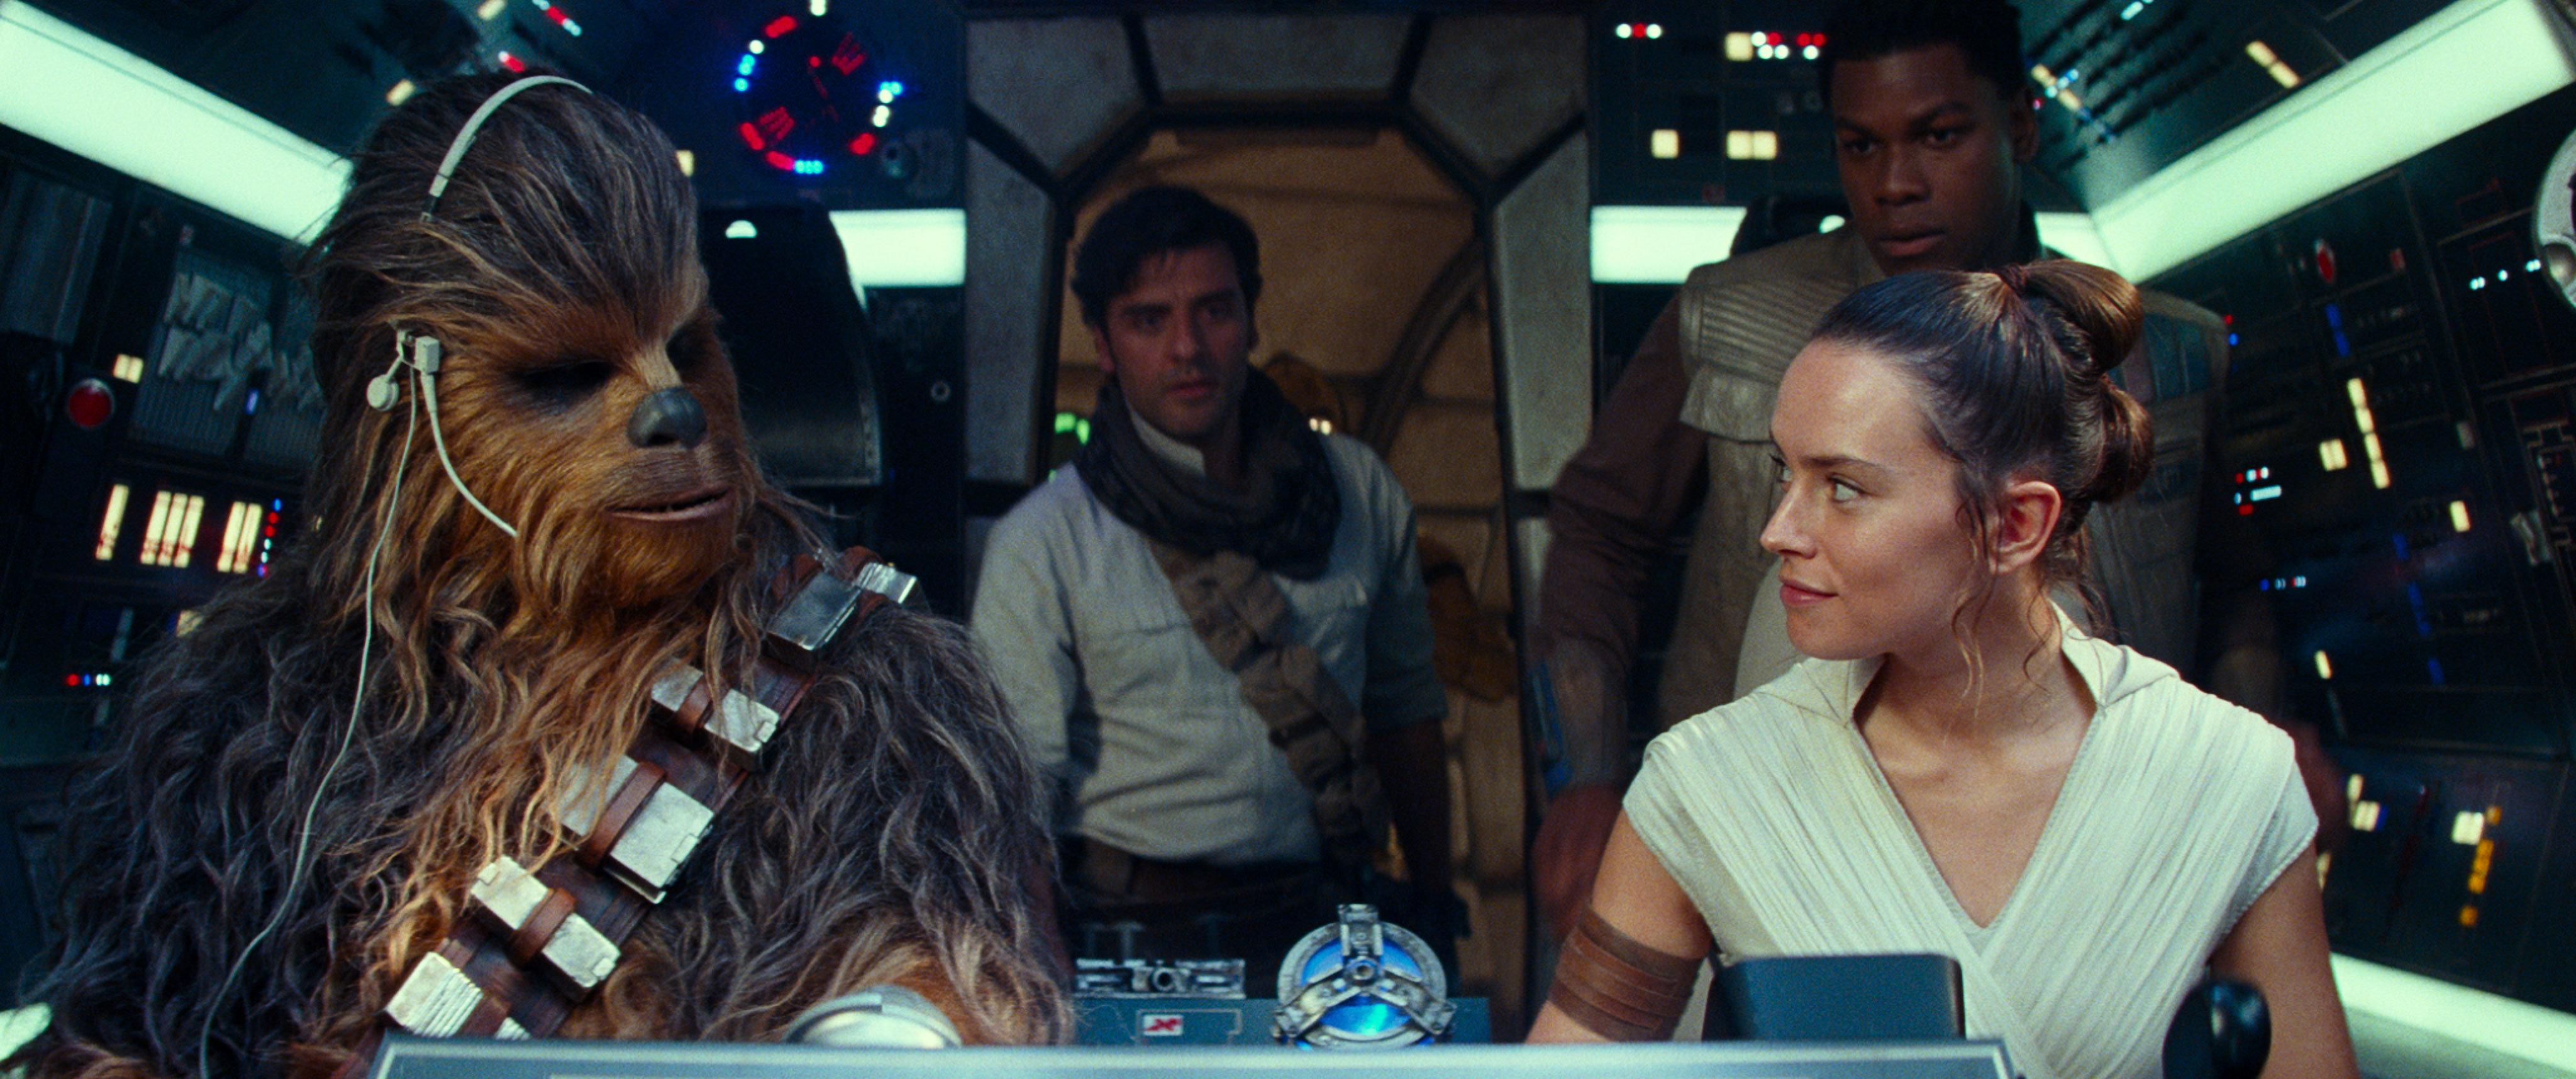 Chewbecca, Poe, Rey e Finn